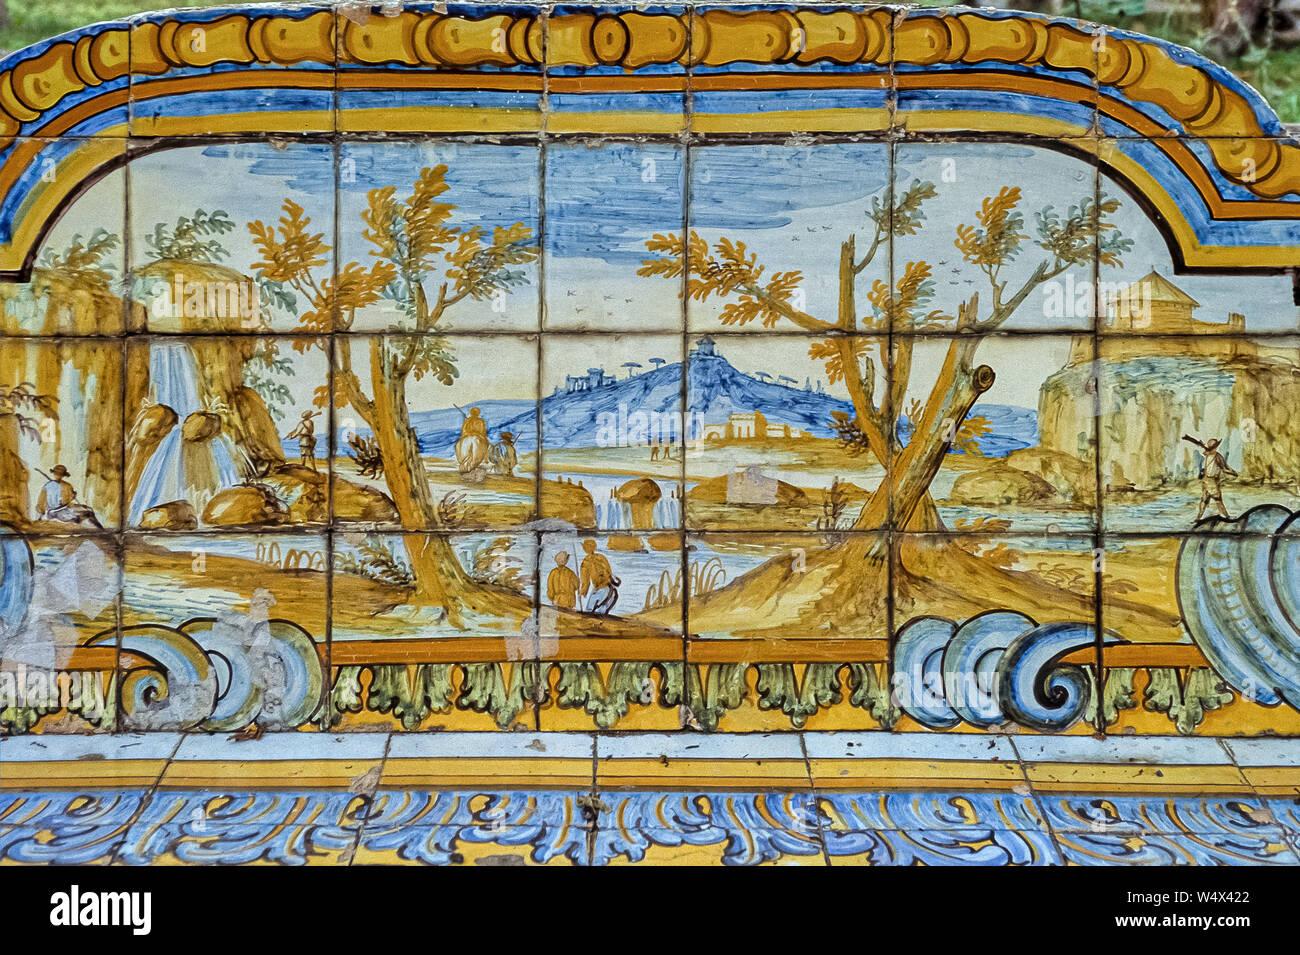 Italy Campania Naples -Monumental complex of Santa Chiara - Santa Chiara Basilica Ceramic  with landscape view in the Cloister Stock Photo